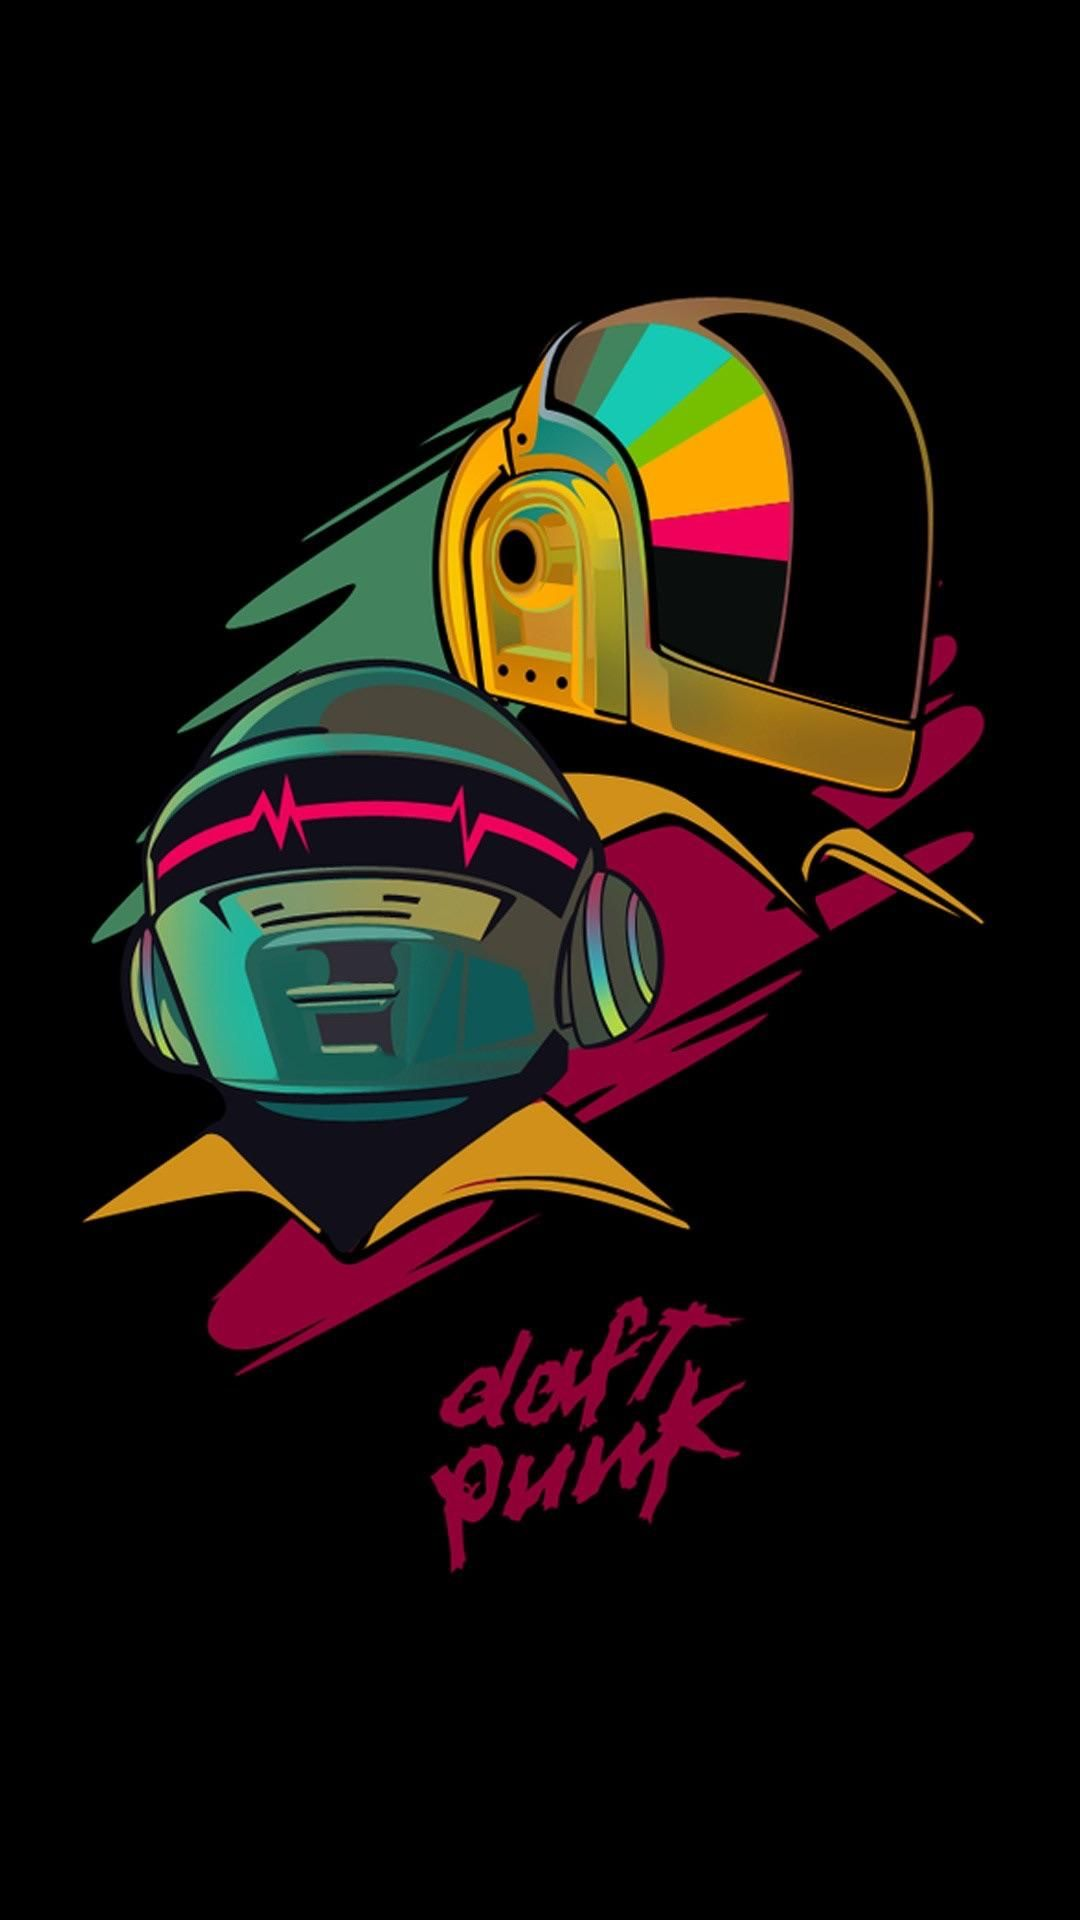 Daft Punk Iphone X Wallpapers Iphonexwallpaper Daft Punk Poster Daft Punk Punk Wallpaper